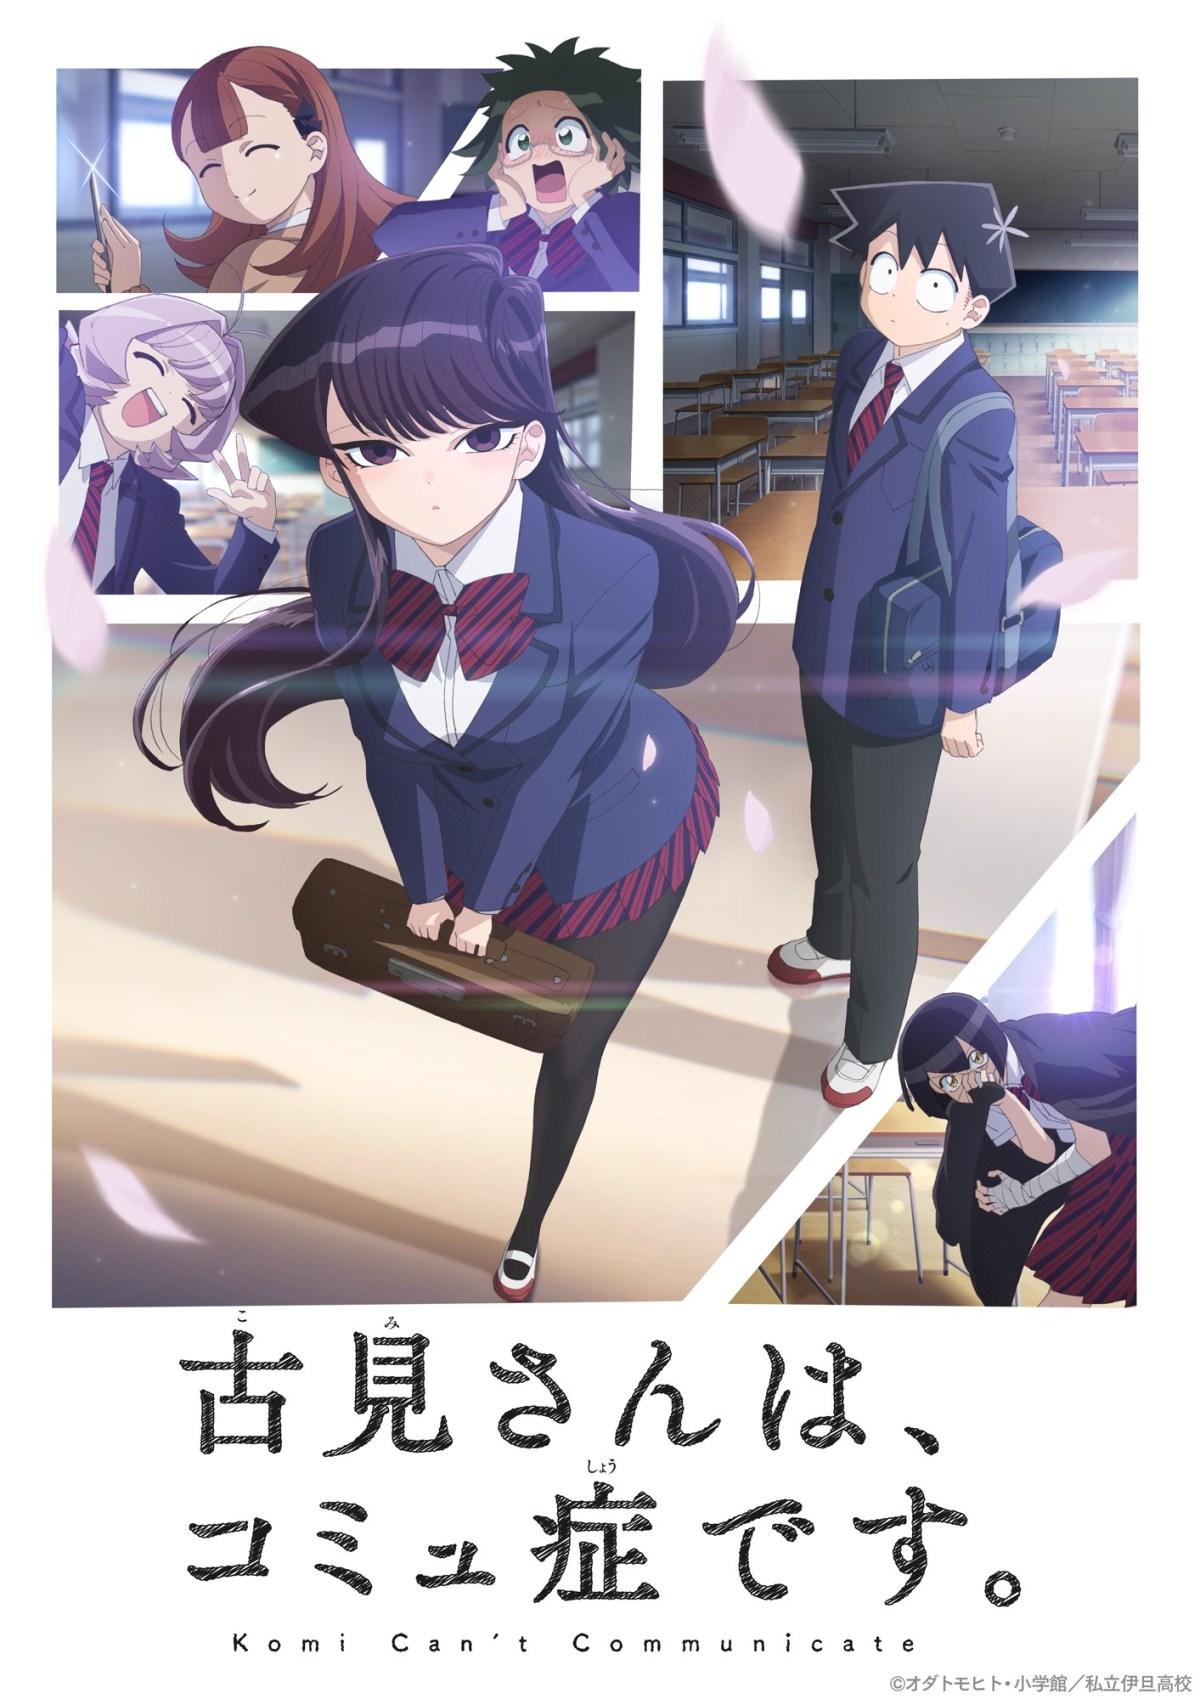 Pembuat Lagu Ending Anime Komi Can't Communicate Akan Mengadakan Konser Desember 2021 2